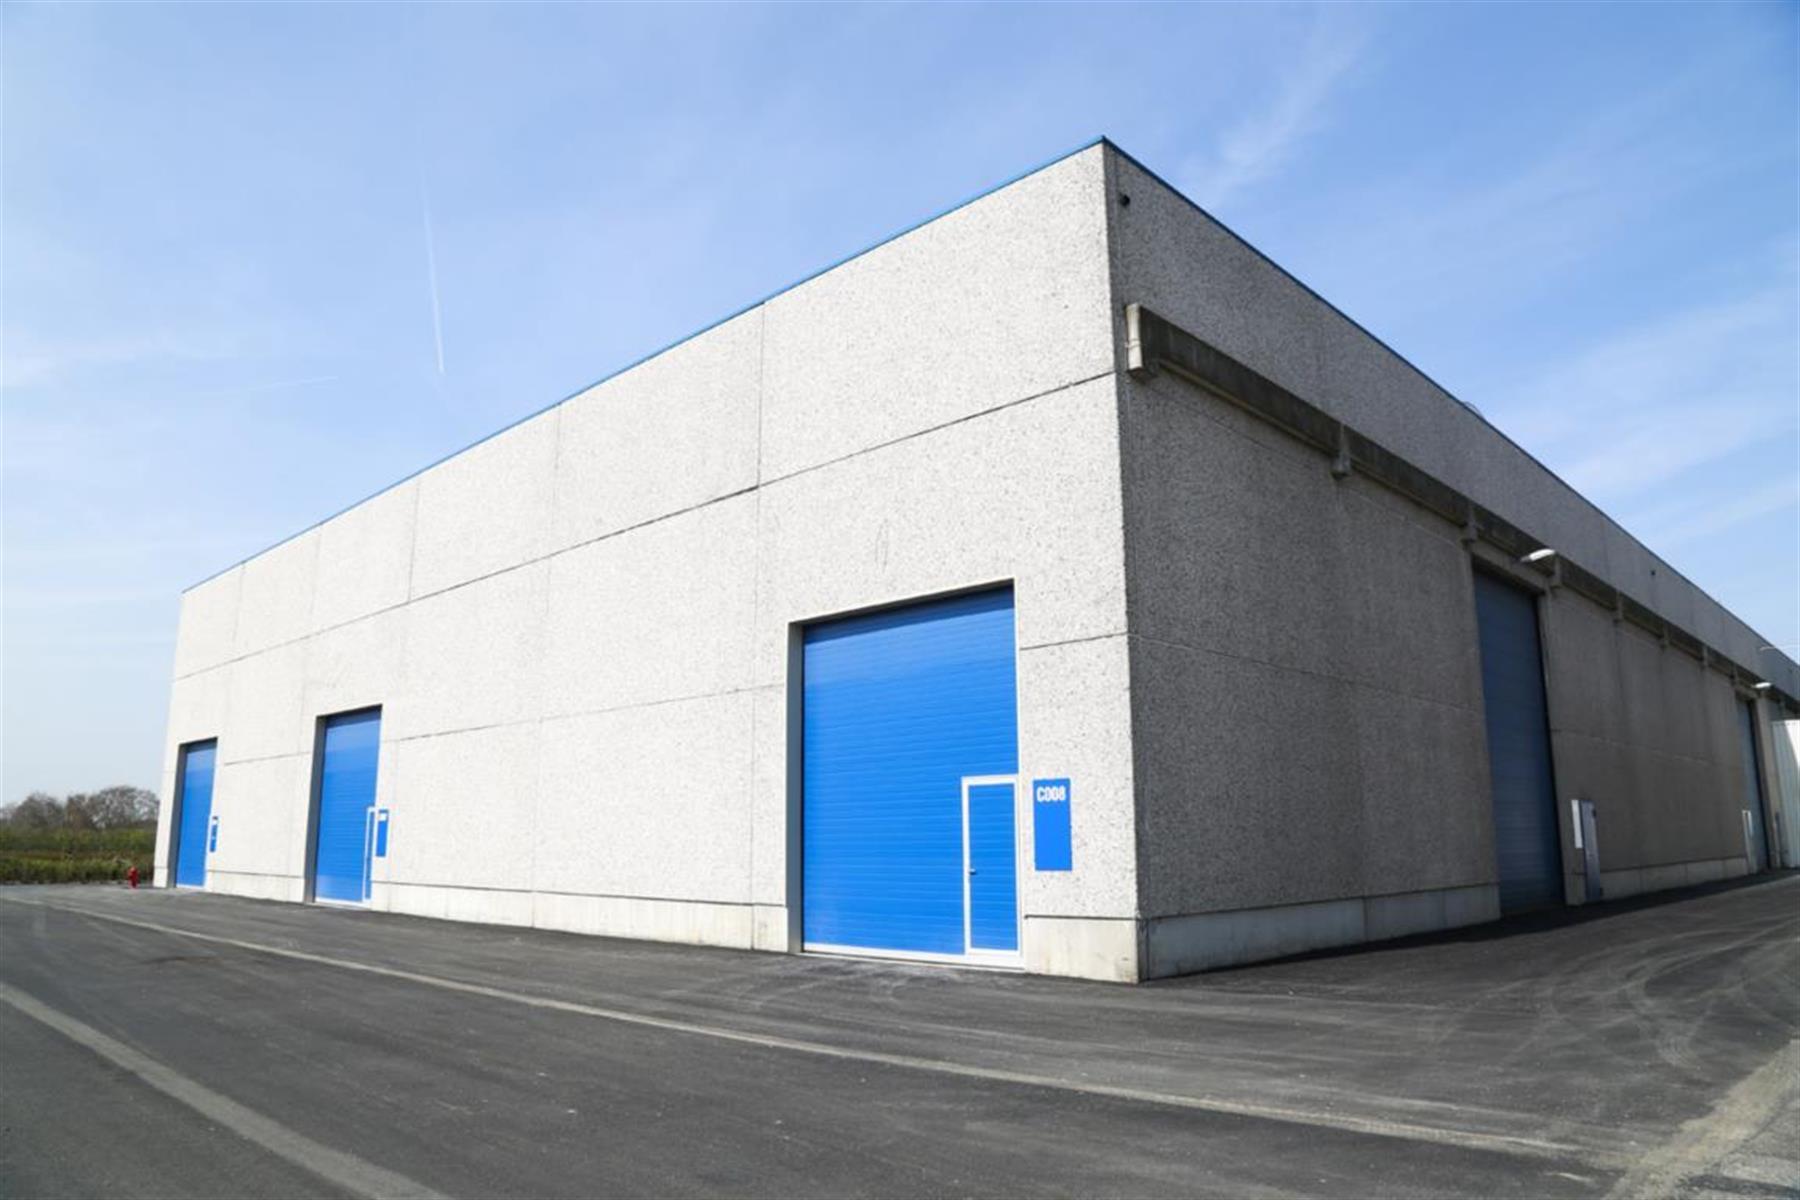 industrieel gebouw te huur KMO UNIT 1620m² MEERDERE LOADING DOCKS te KAPELLEN (B002) 1640m² - 2950 Kapellen, België 10